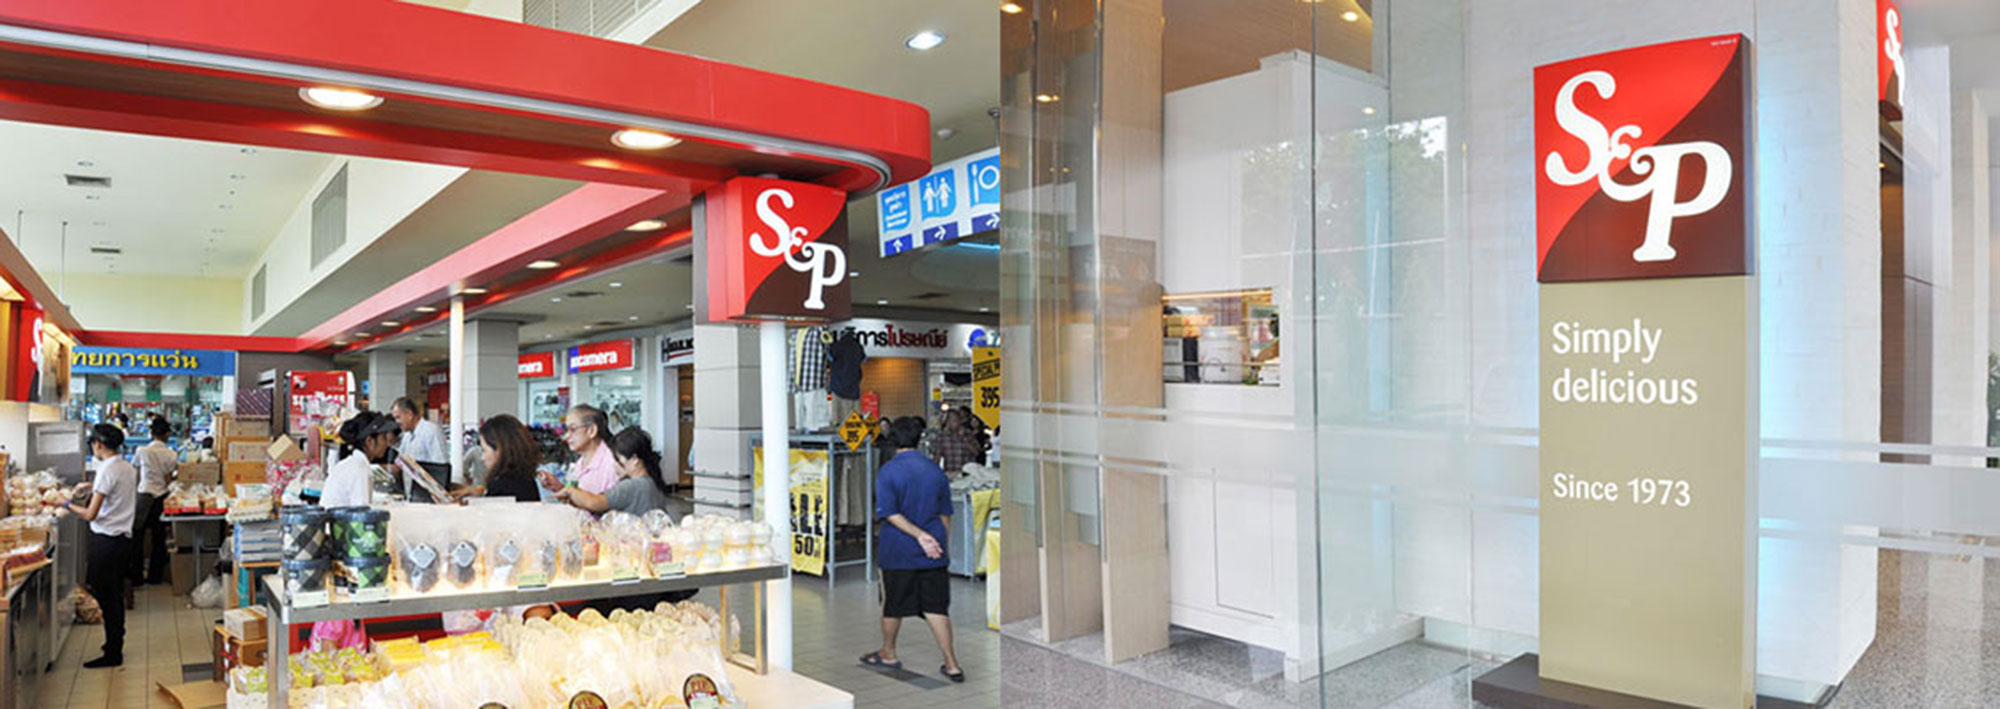 s and p retail design